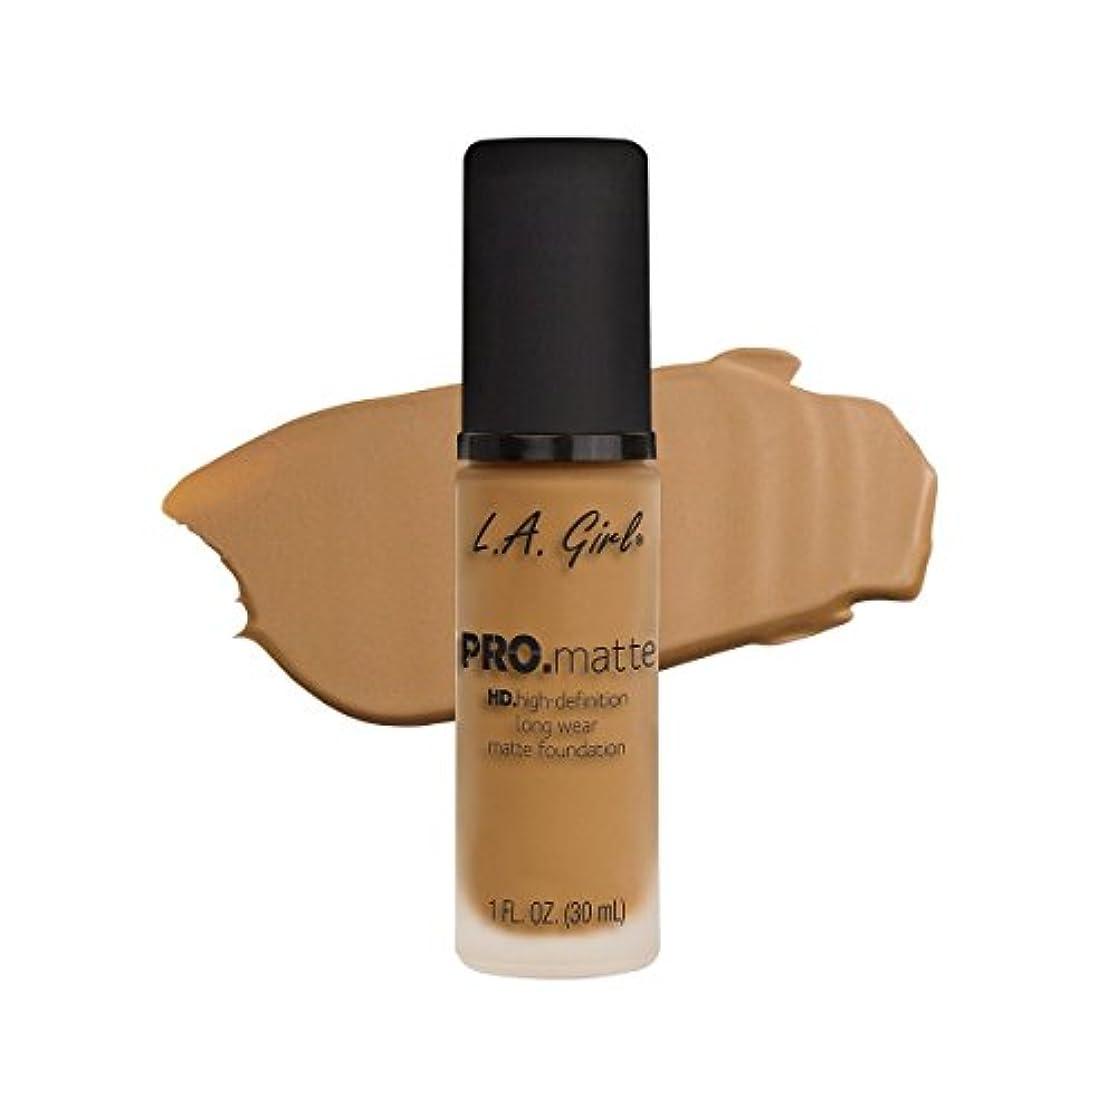 (6 Pack) L.A. GIRL Pro Matte Foundation - Sand (並行輸入品)